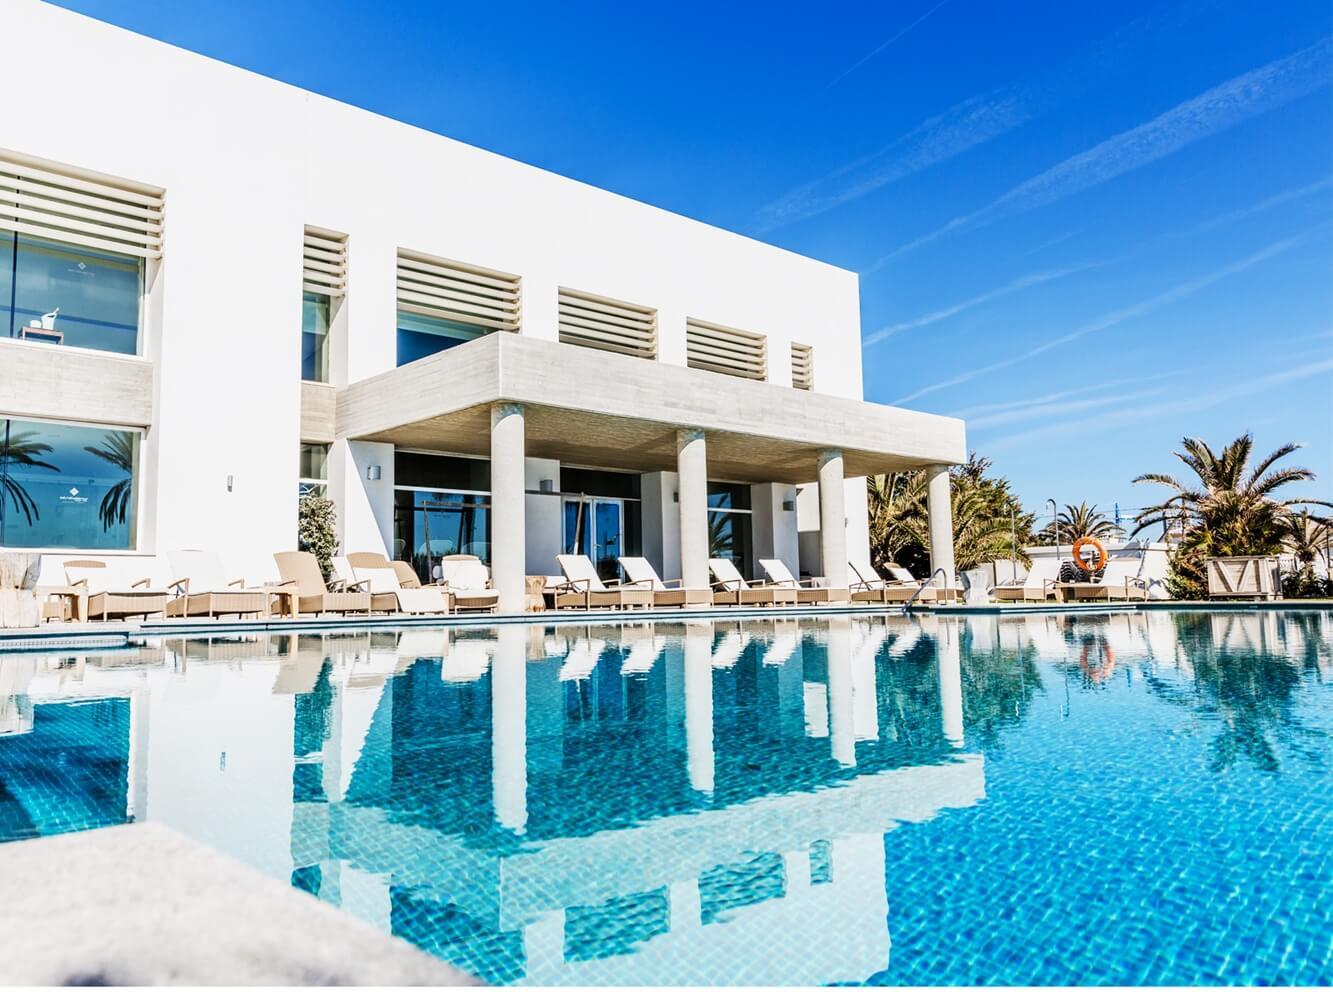 Piscina beach club hotel vincci estrella de mar hidroingenia - Estrella del mar beach club ...